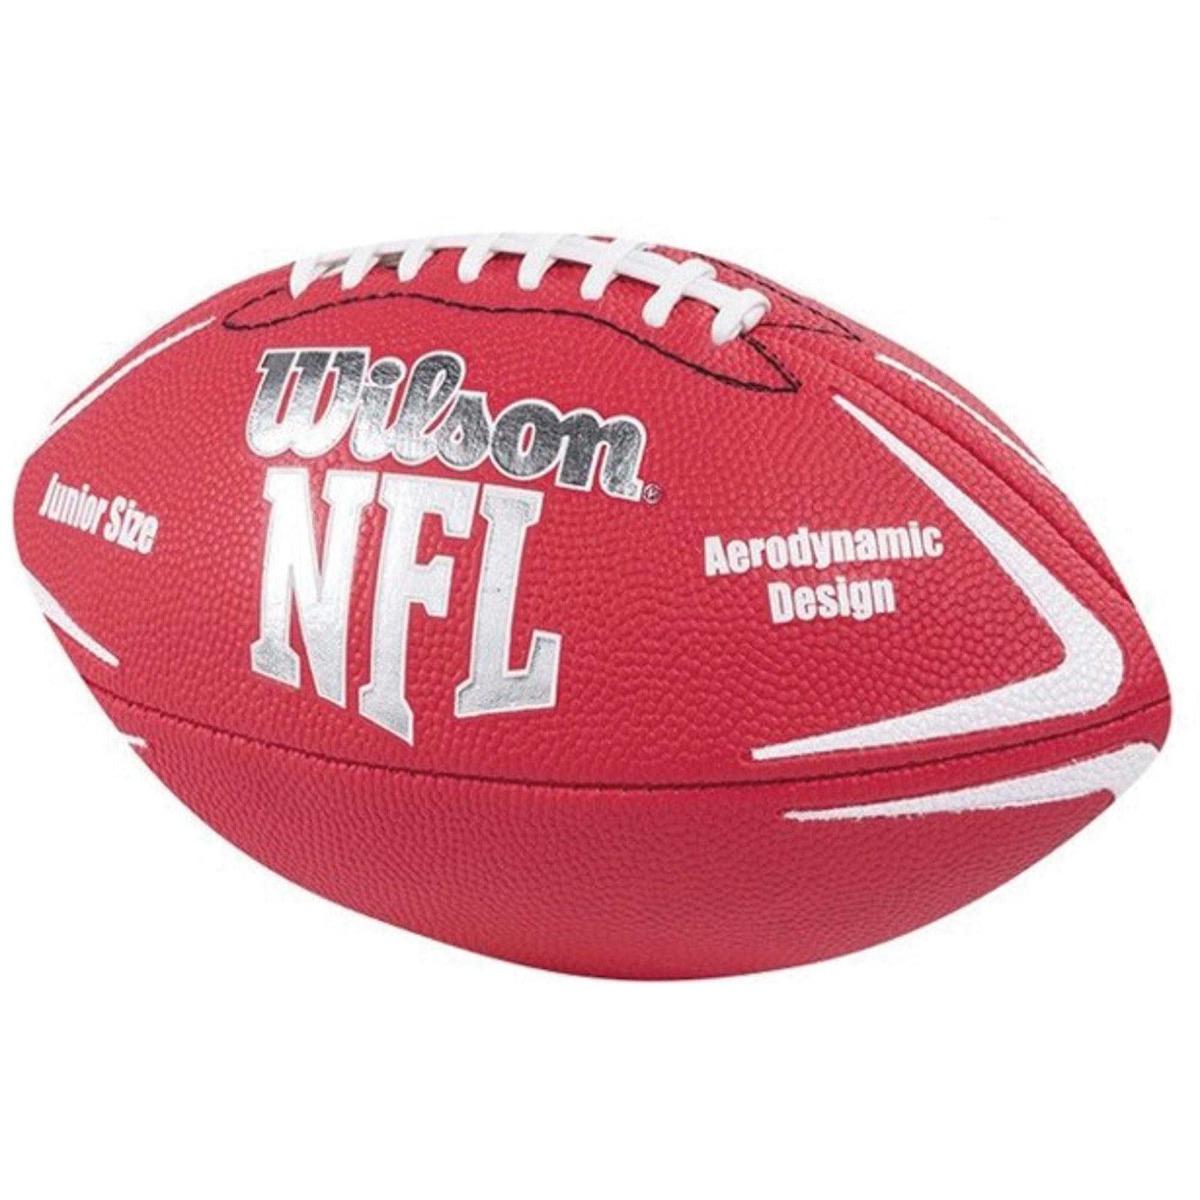 Bola Futebol Americano Nfl Avenger Junior Vermelha Wilson - R  76 4bc70ec41b7c6